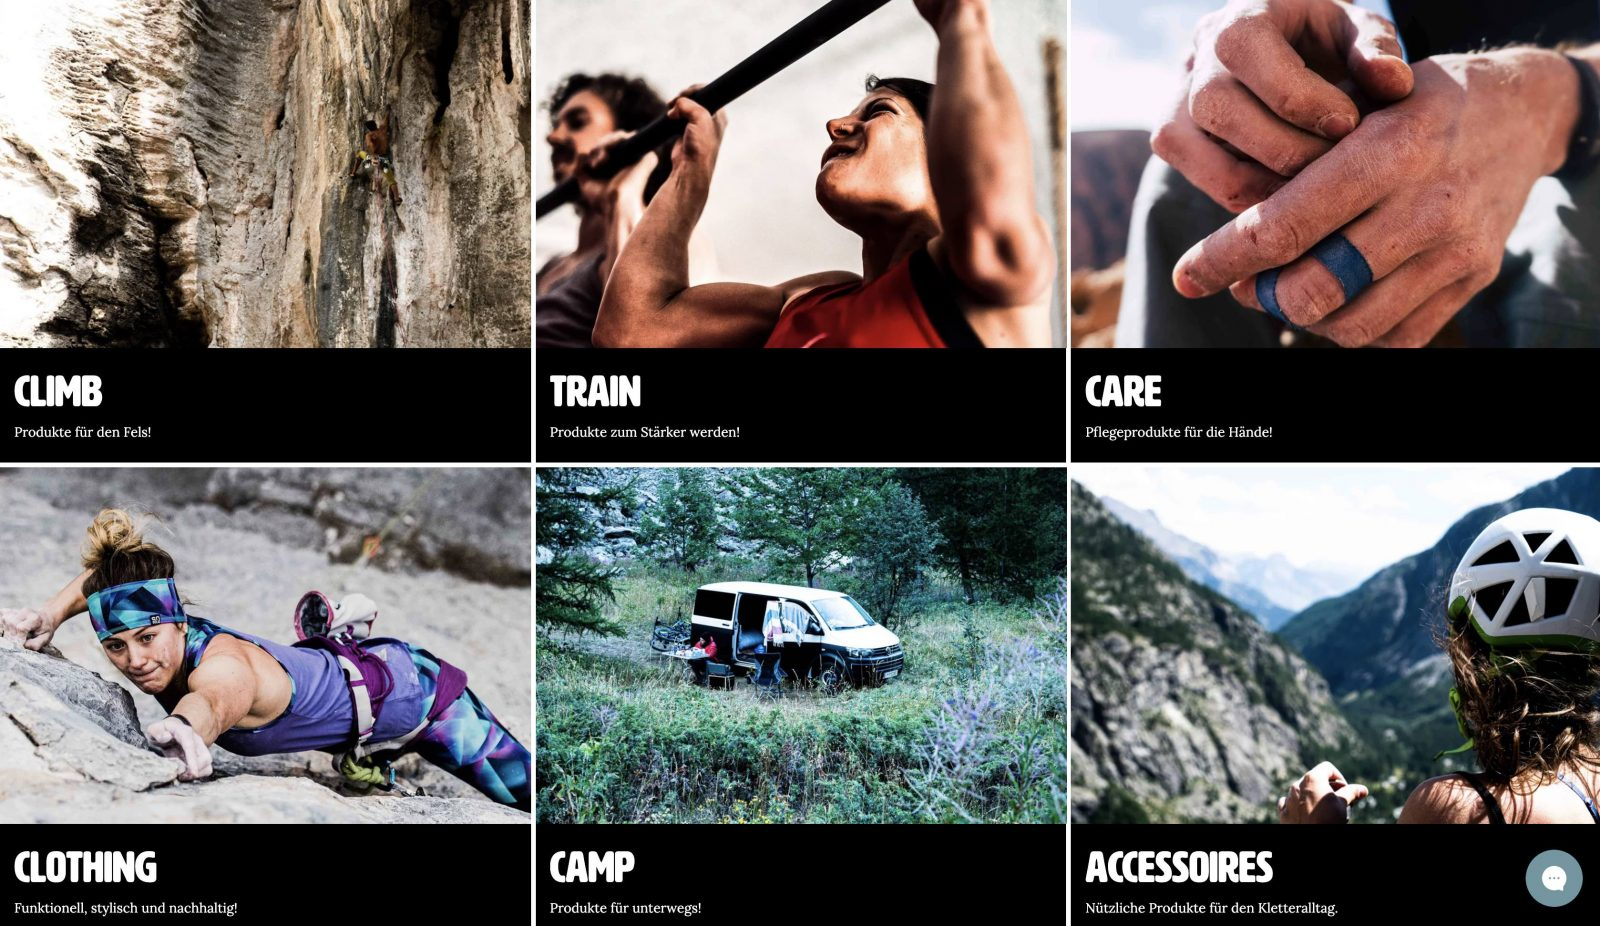 Climbers Finest, Foto: Climbers Finest |Climbers Paradise